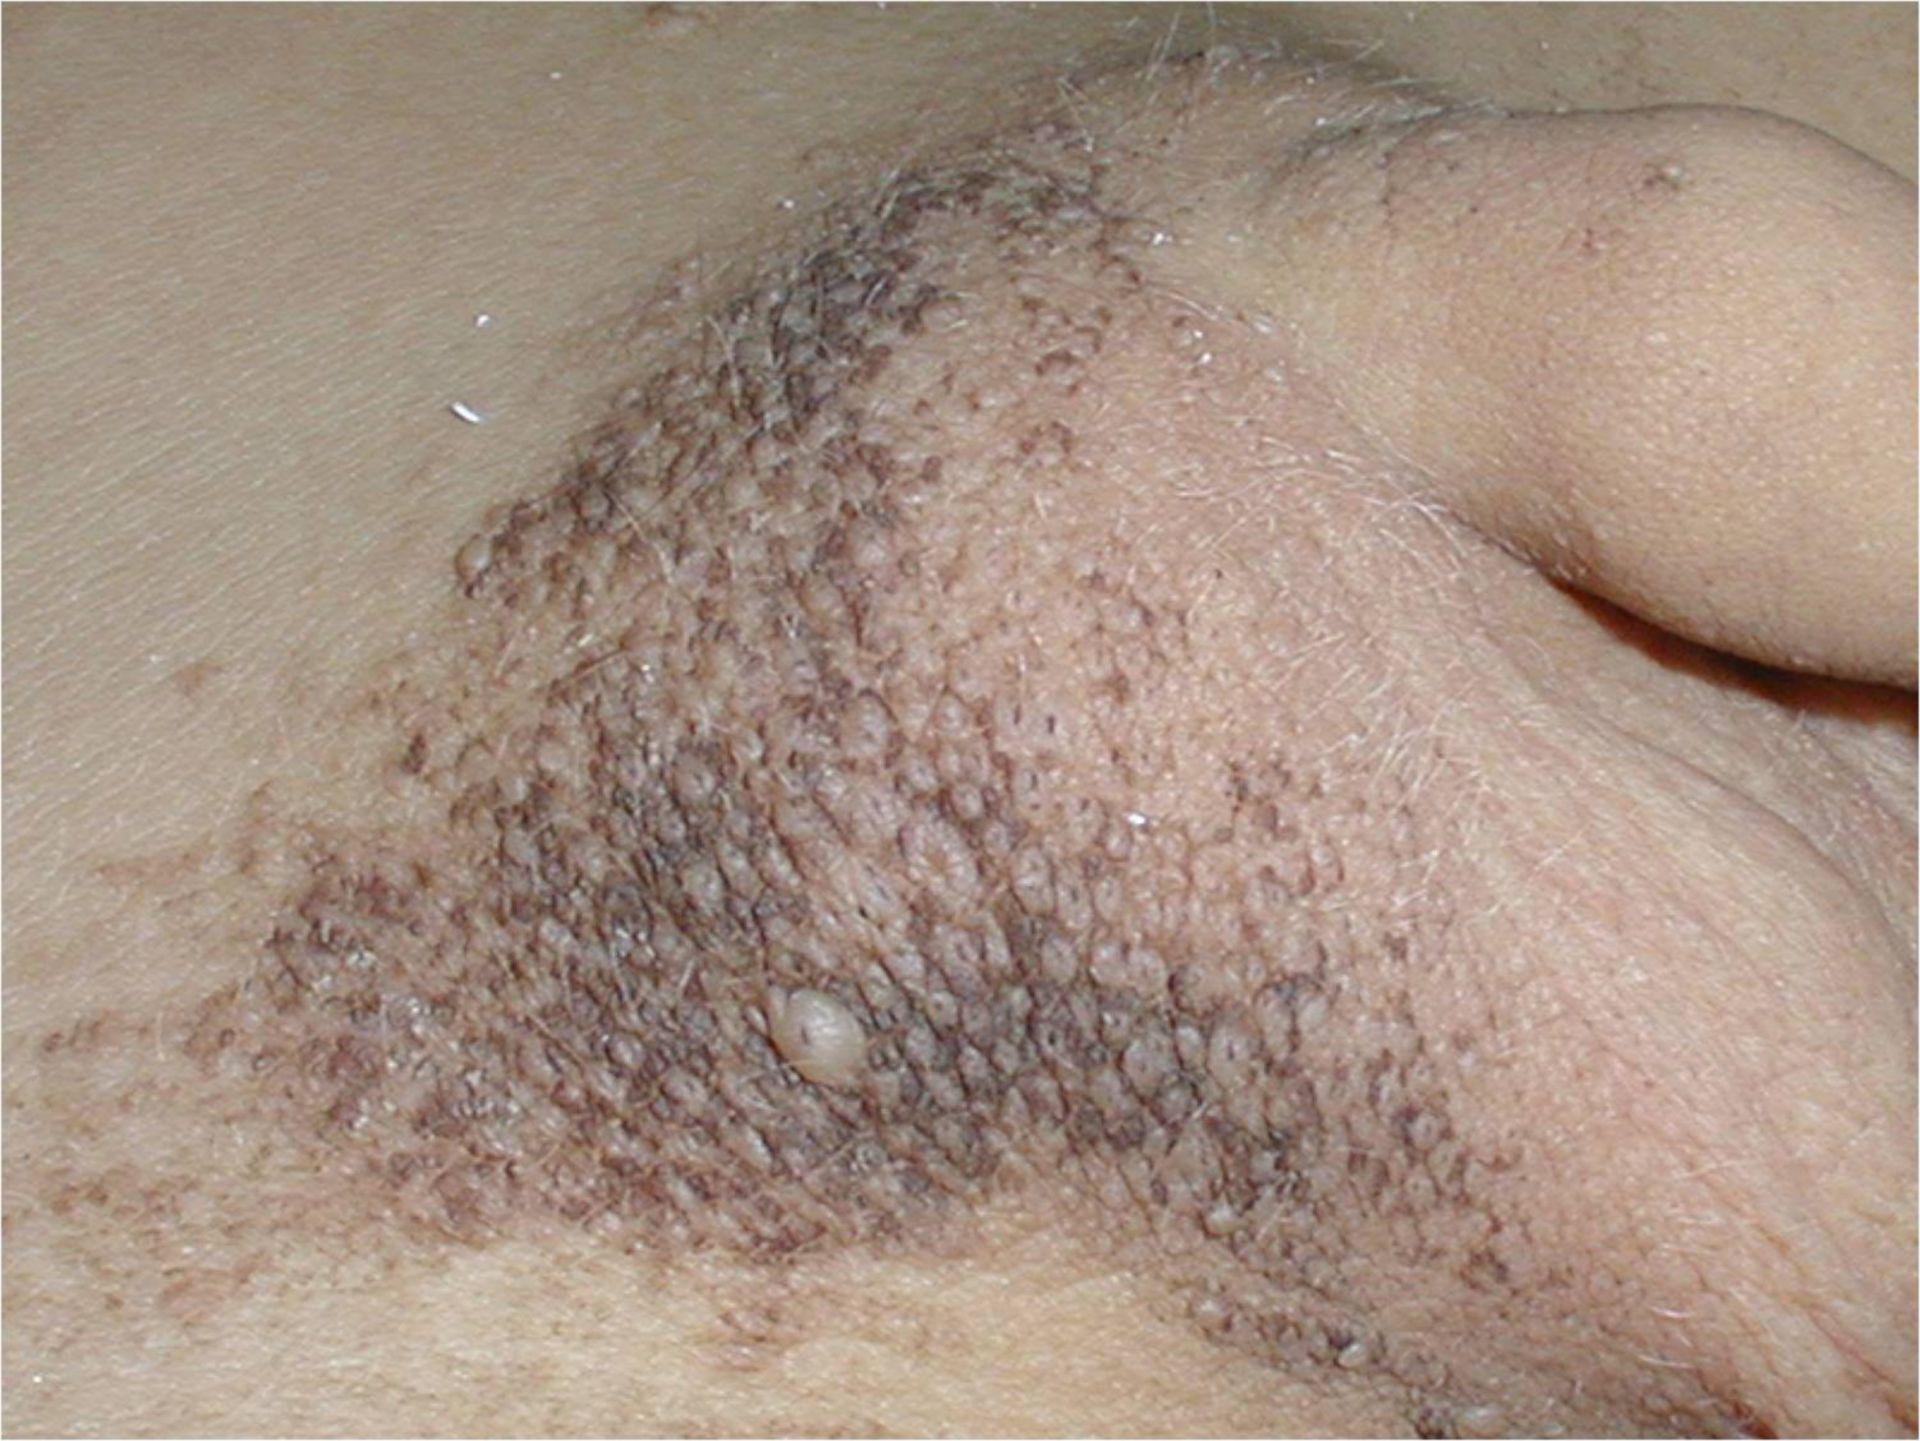 Adenoma sebaceum 1